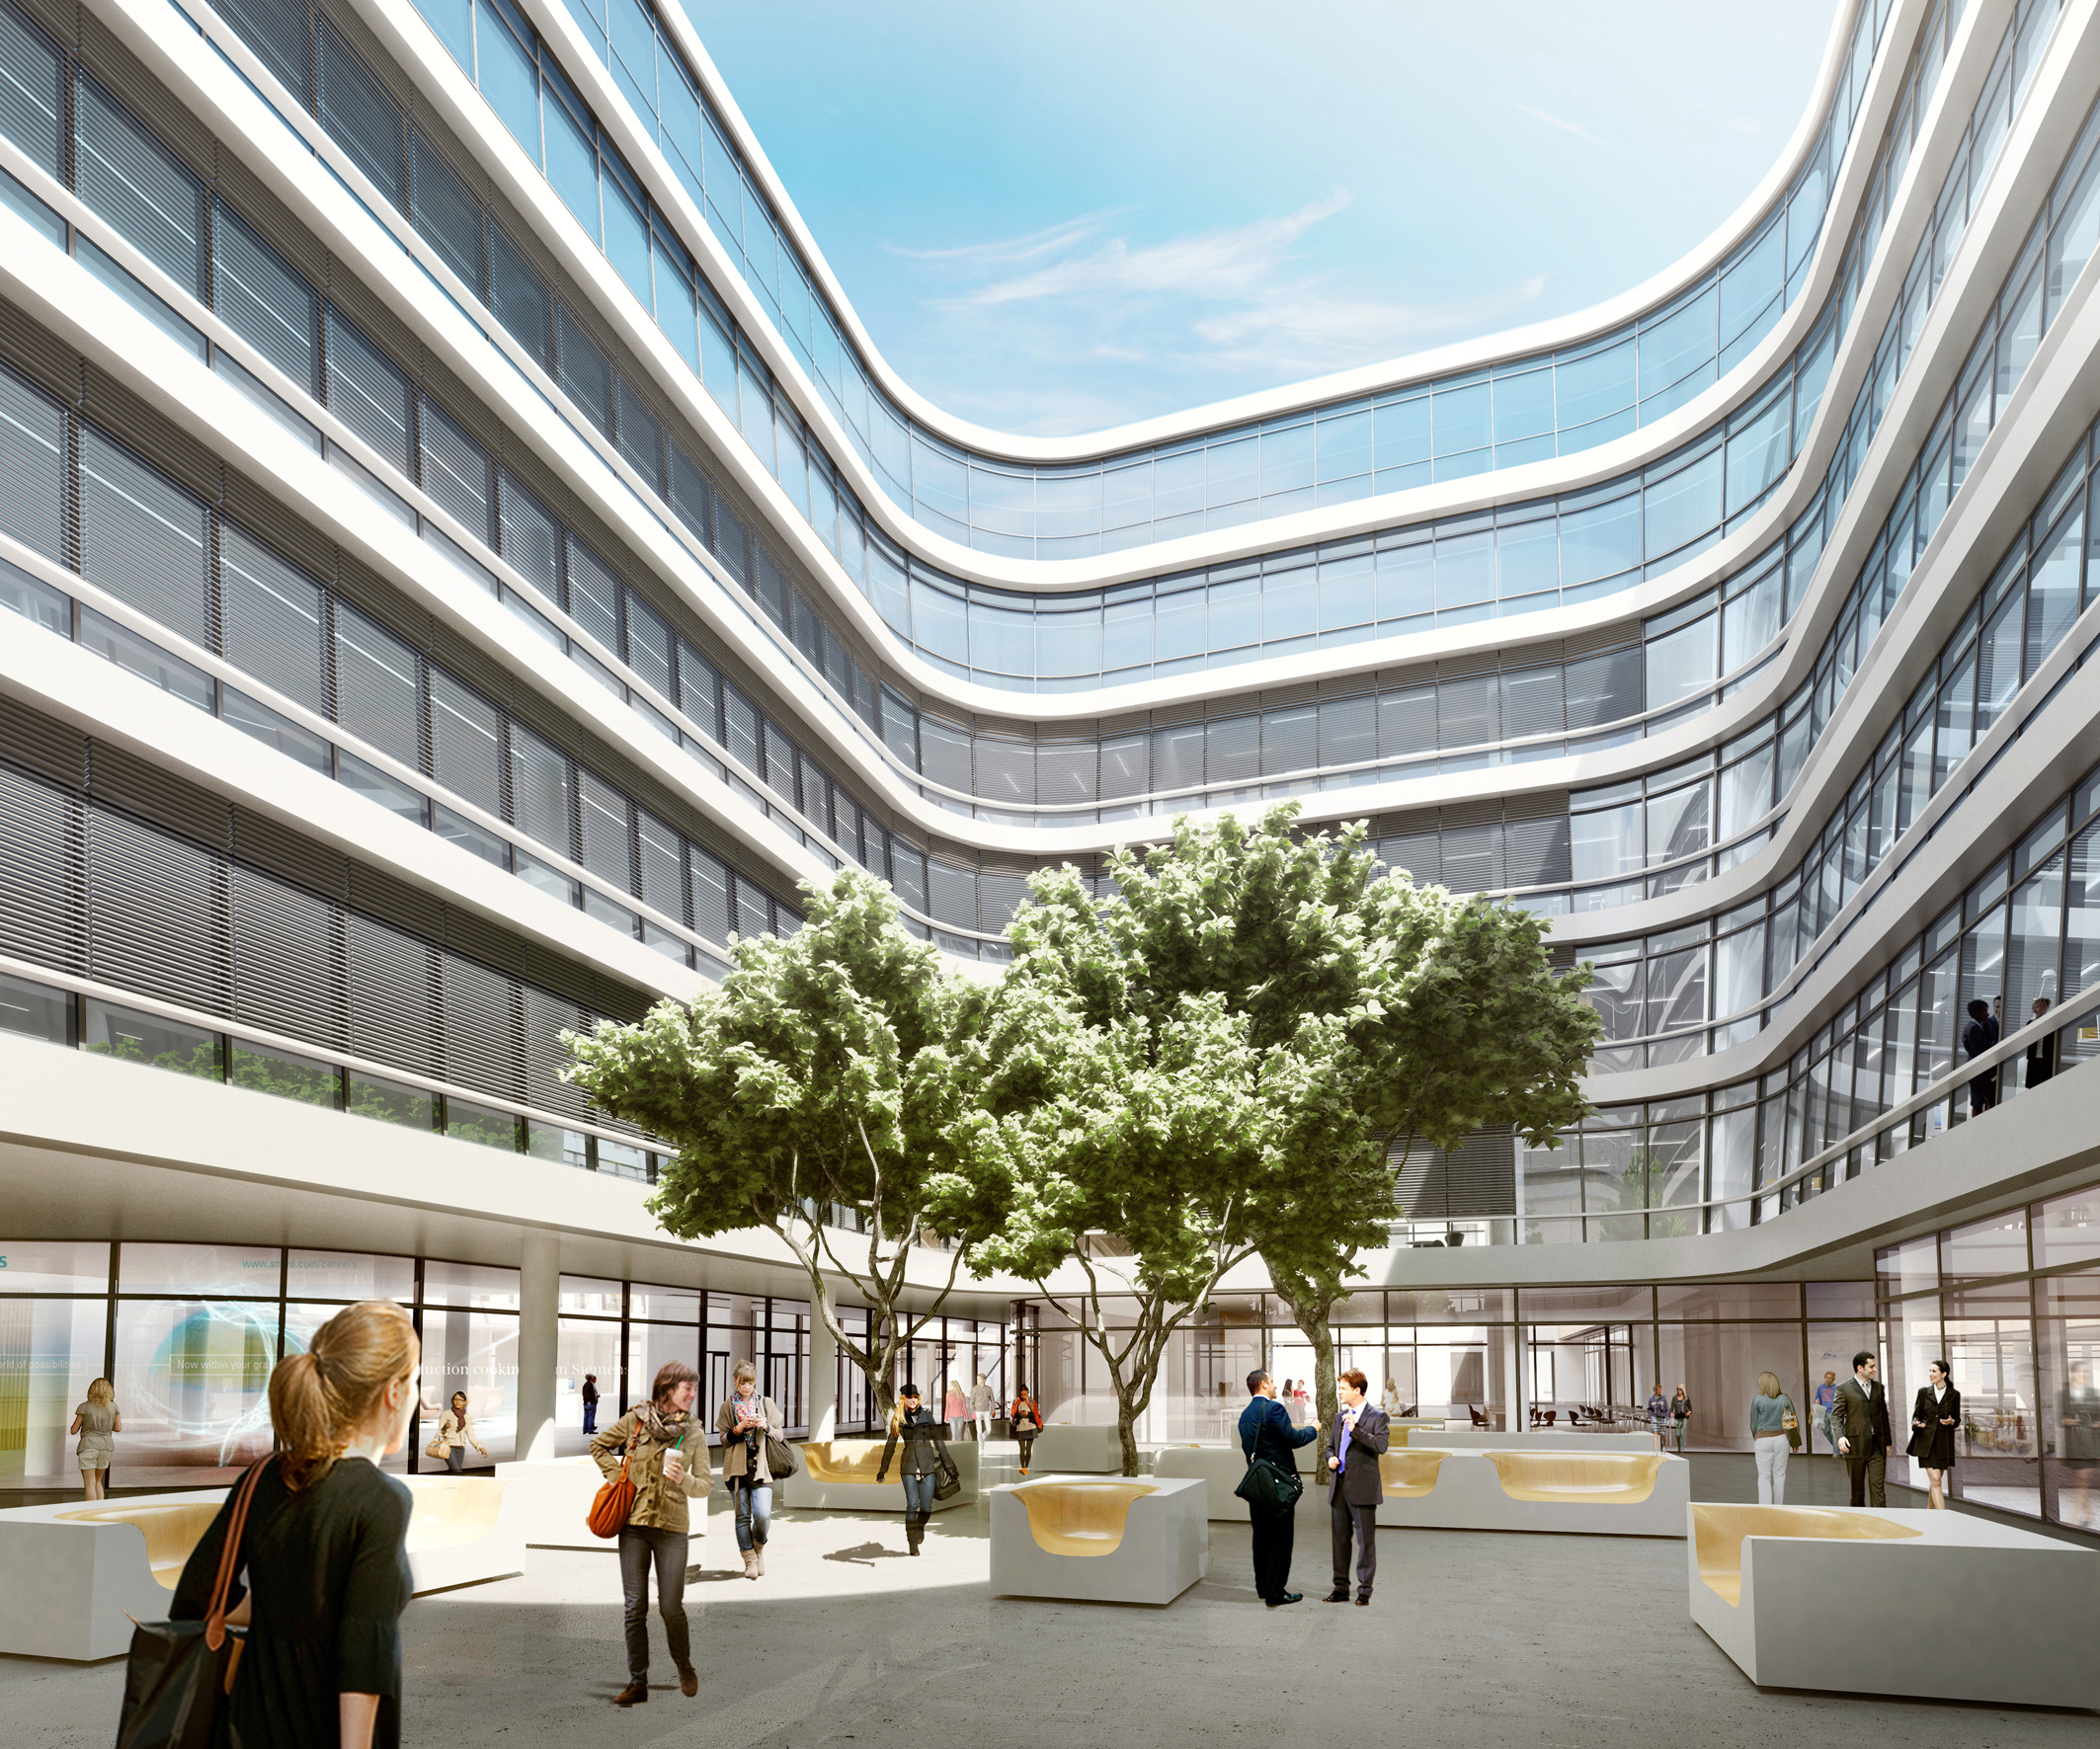 Siemens completes gargantuan business process automation project